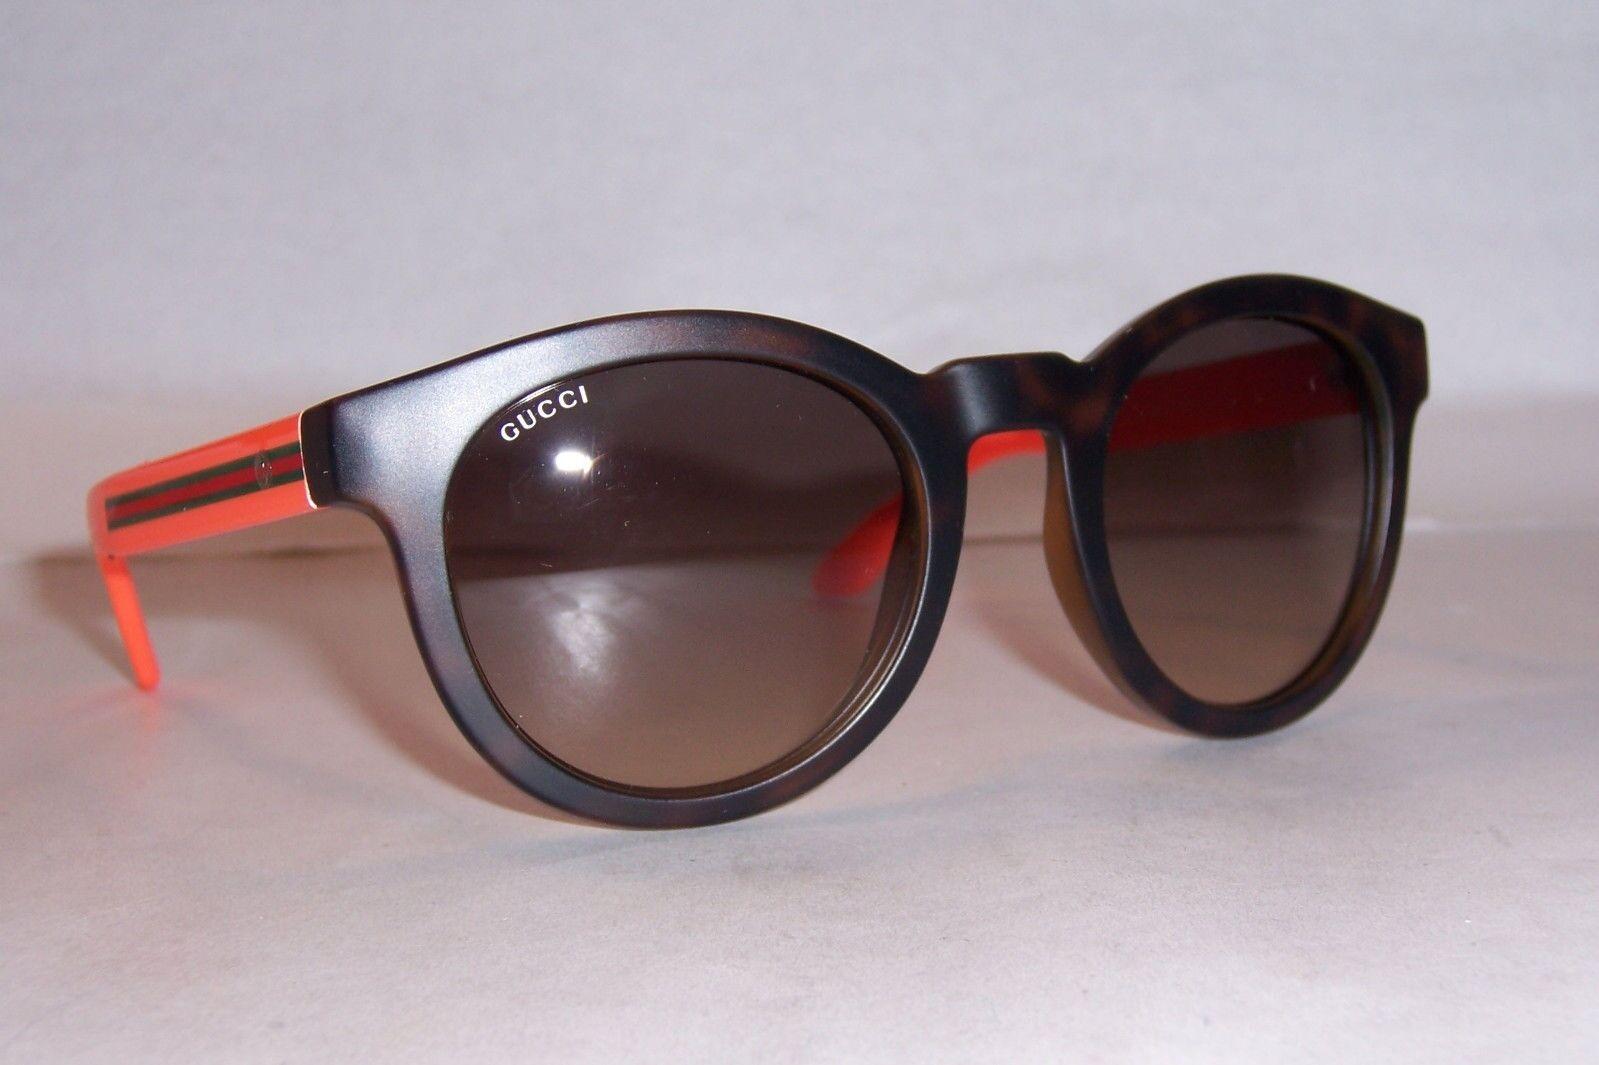 24dd50ecd5549 Gucci Sunglasses GG 3653 s 18oed 100 Authentic for sale online